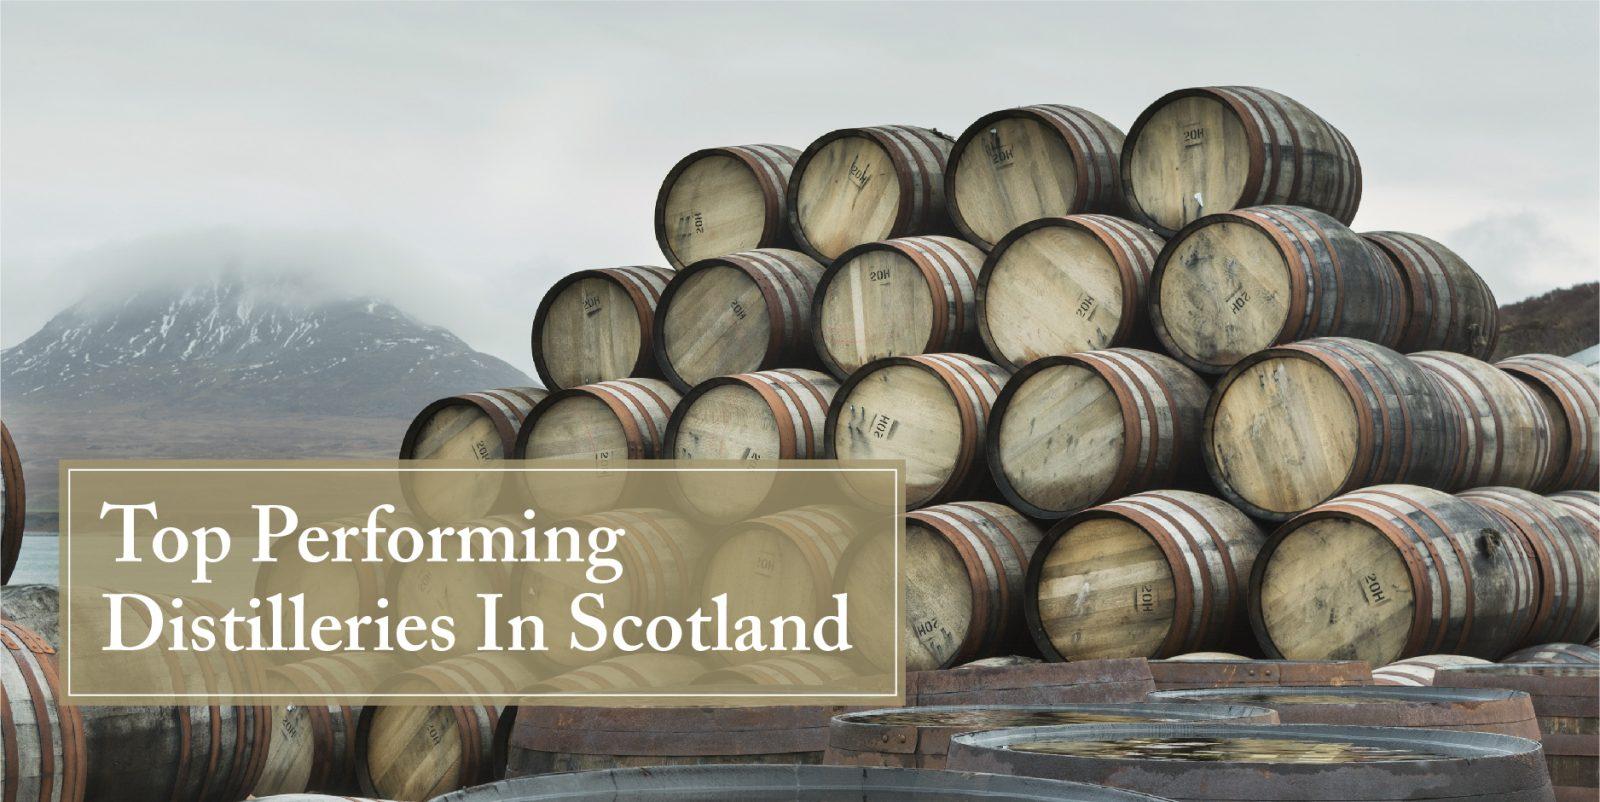 Top performing distilleries In Scotland